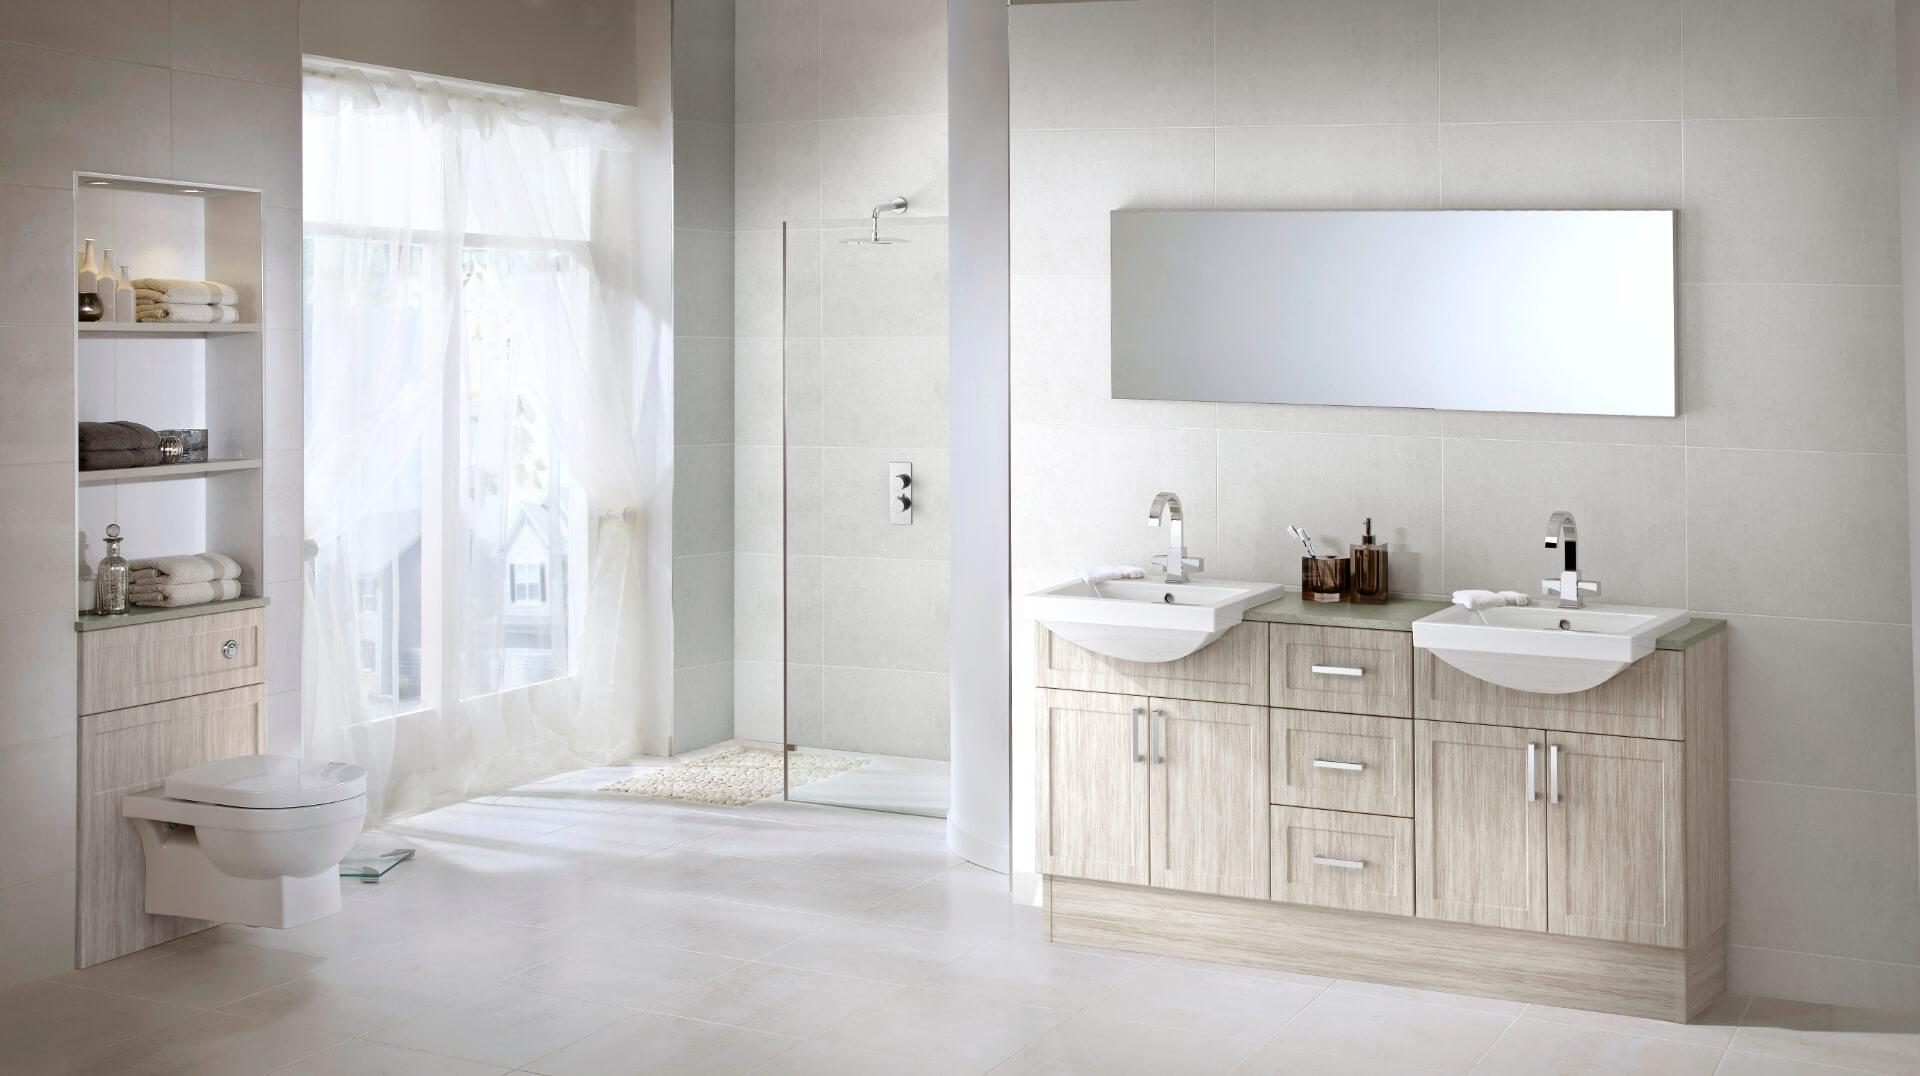 Nolte Original Fitted Wooden Bathroom